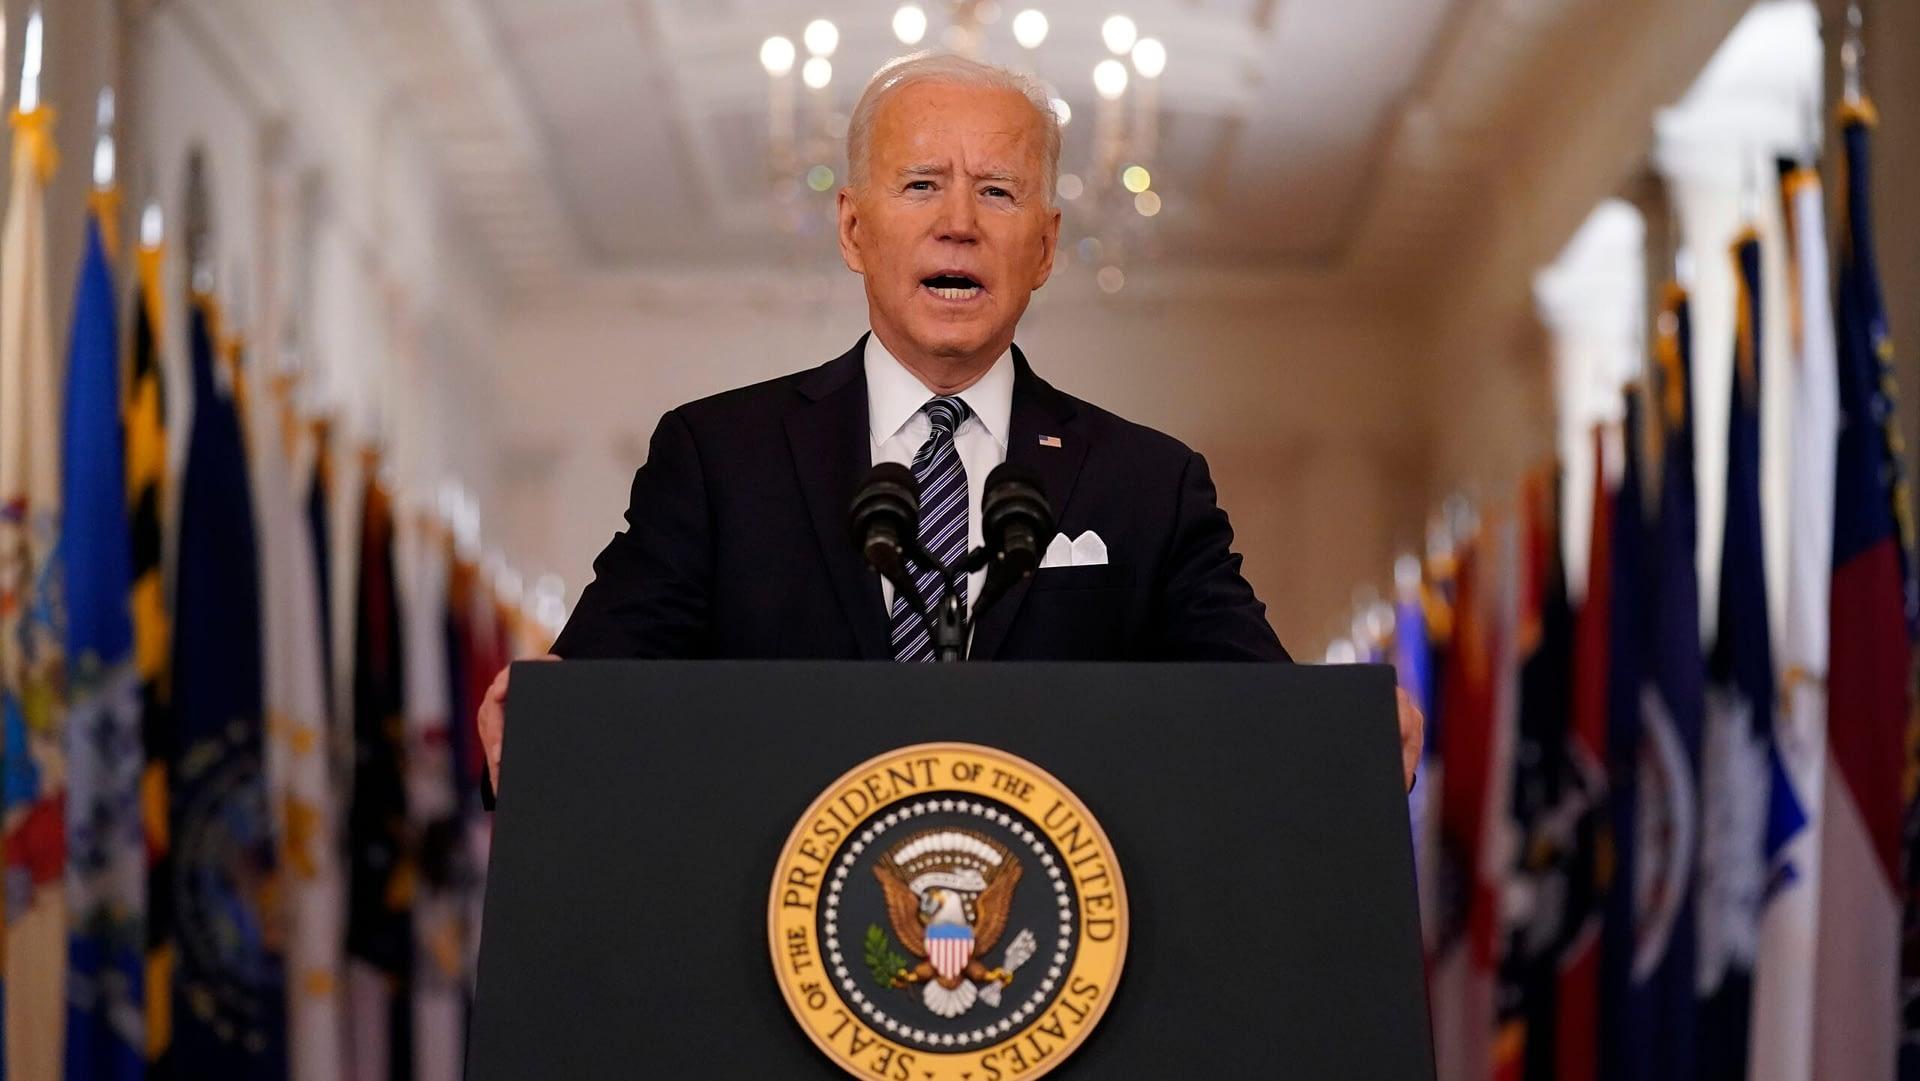 Joe Biden giving his first national primetime address